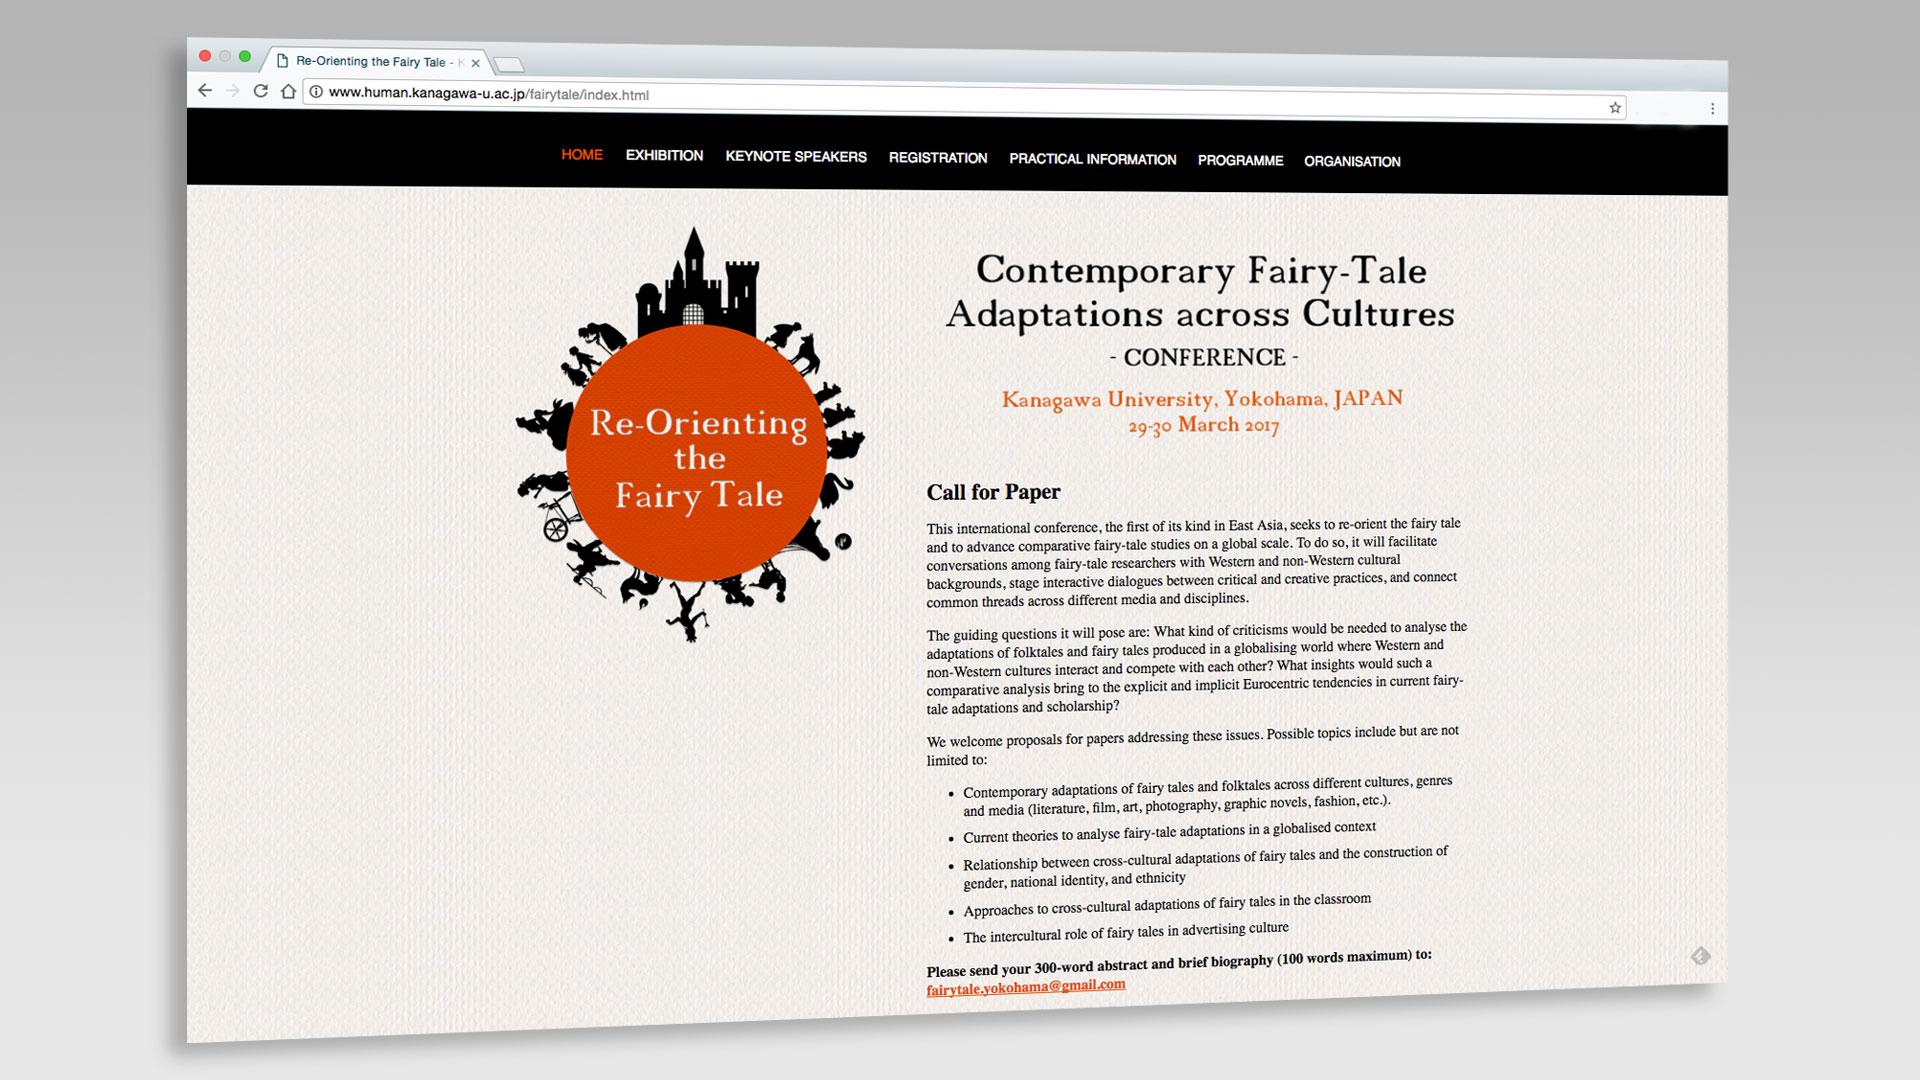 Kanagawa University - Re-Orienting the Fairy Tale